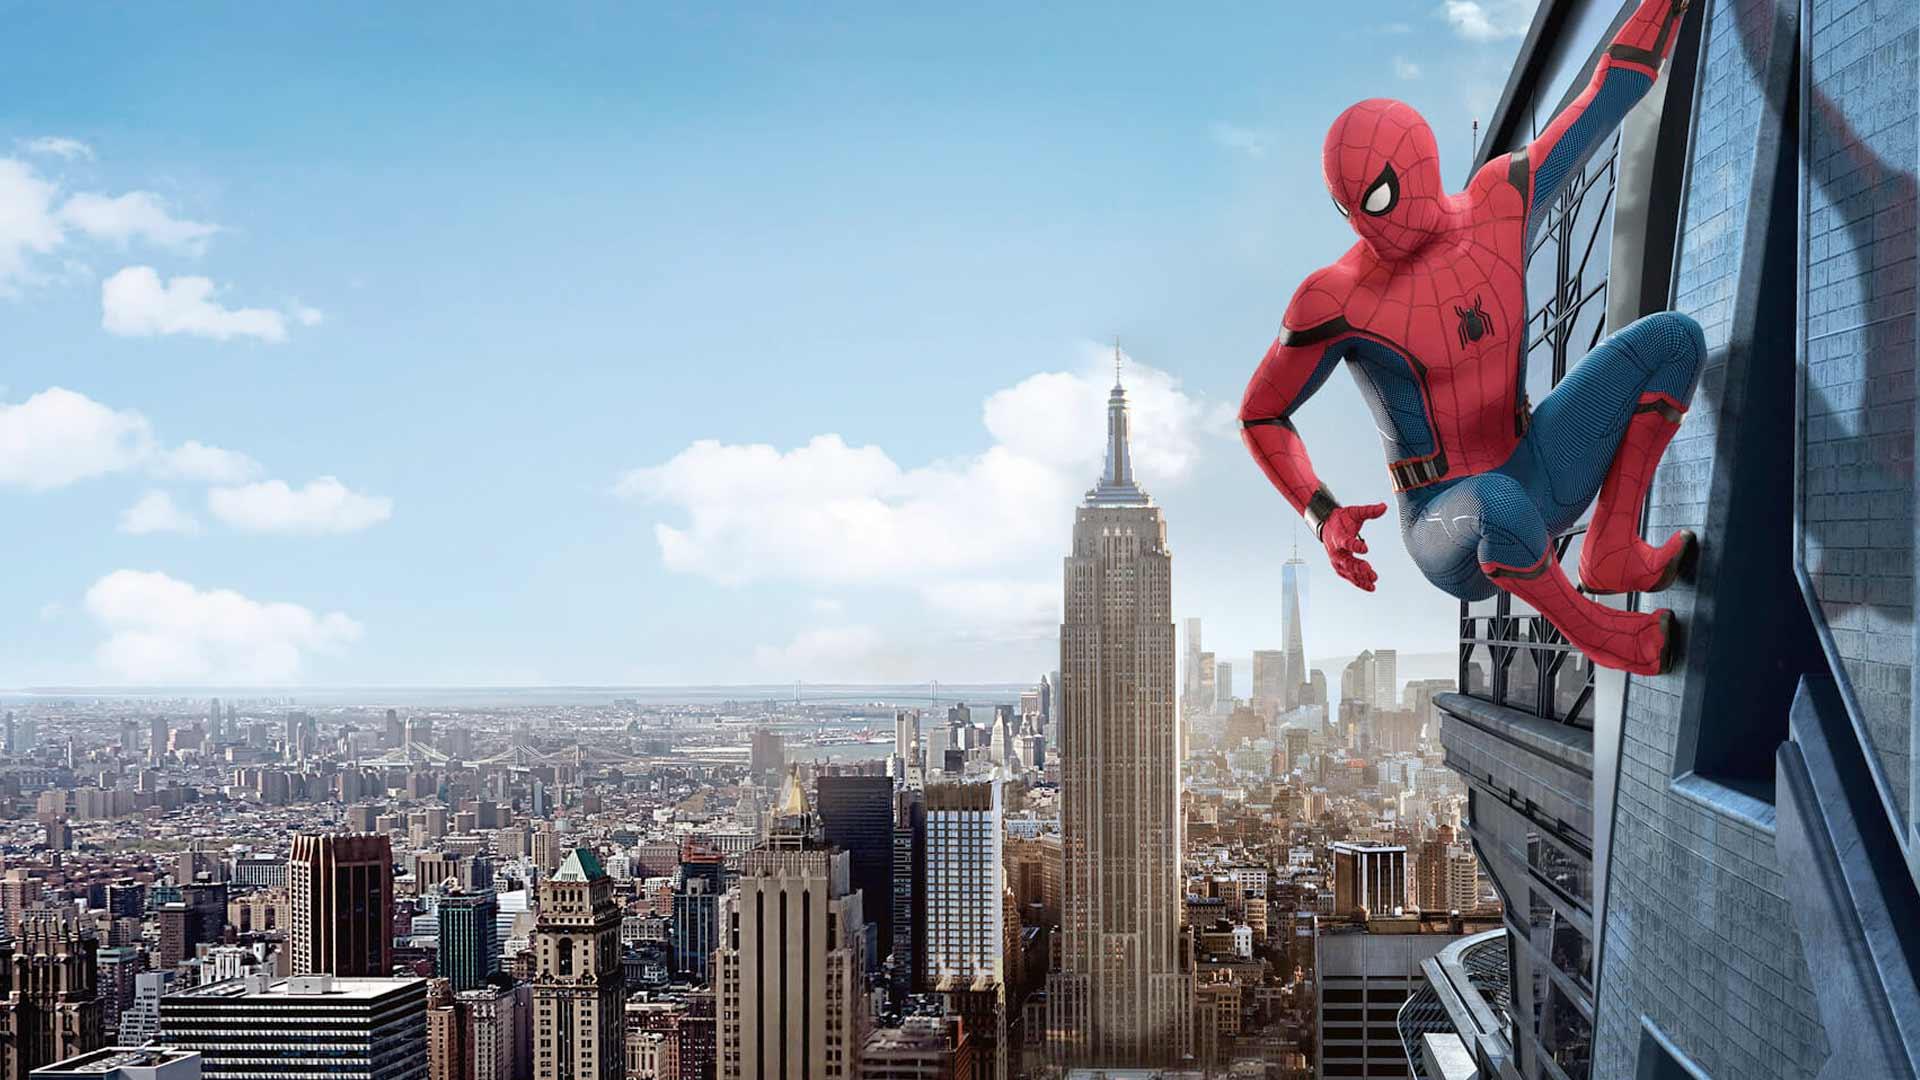 spider-man-homecoming-2017-after-credits-hq.jpg